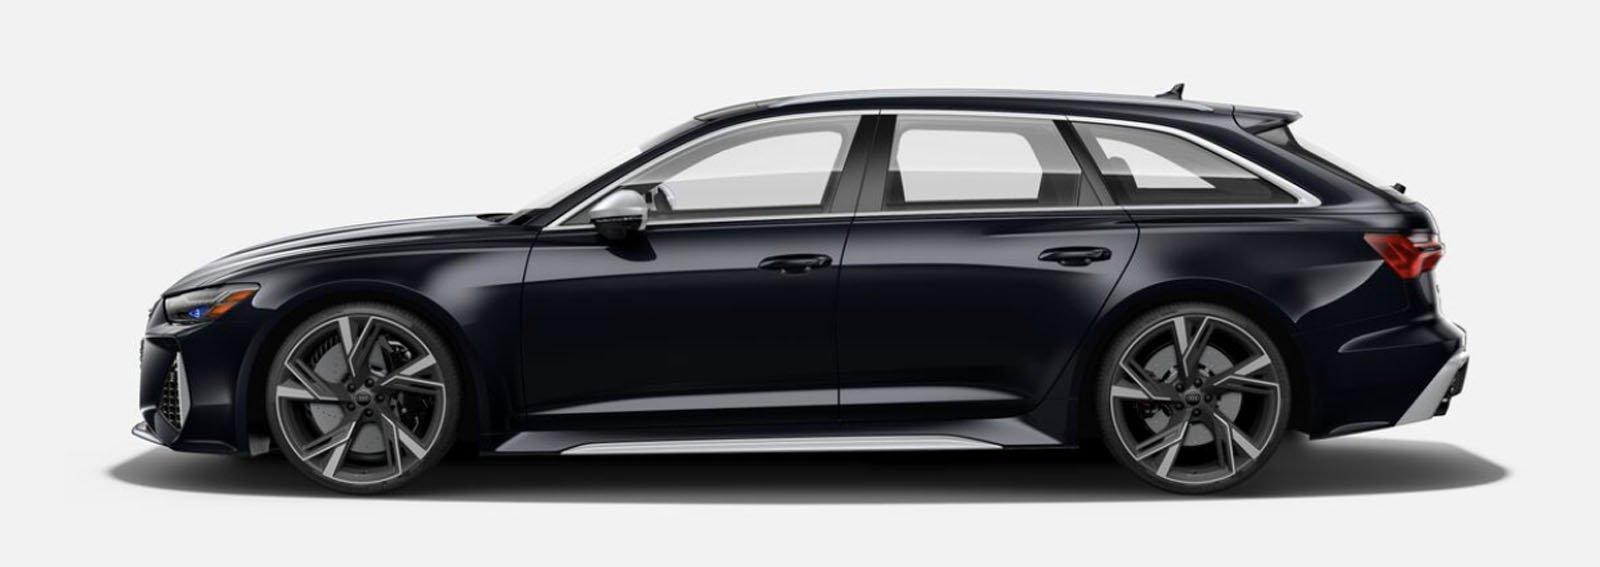 2021 Audi RS 6 Avant Sebring Black